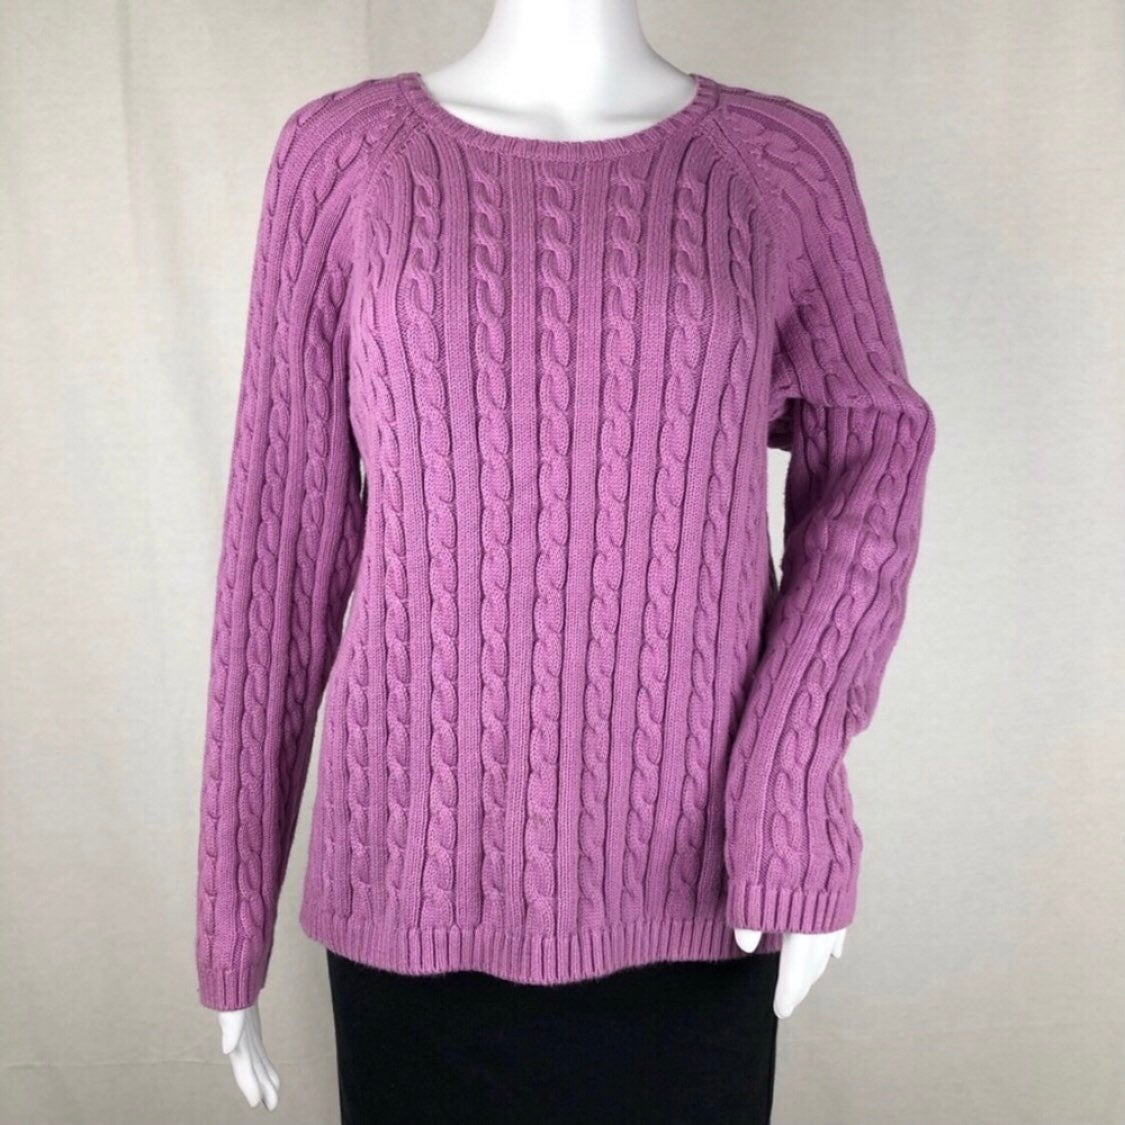 L.L. Bean Lavender Crewneck Sweater